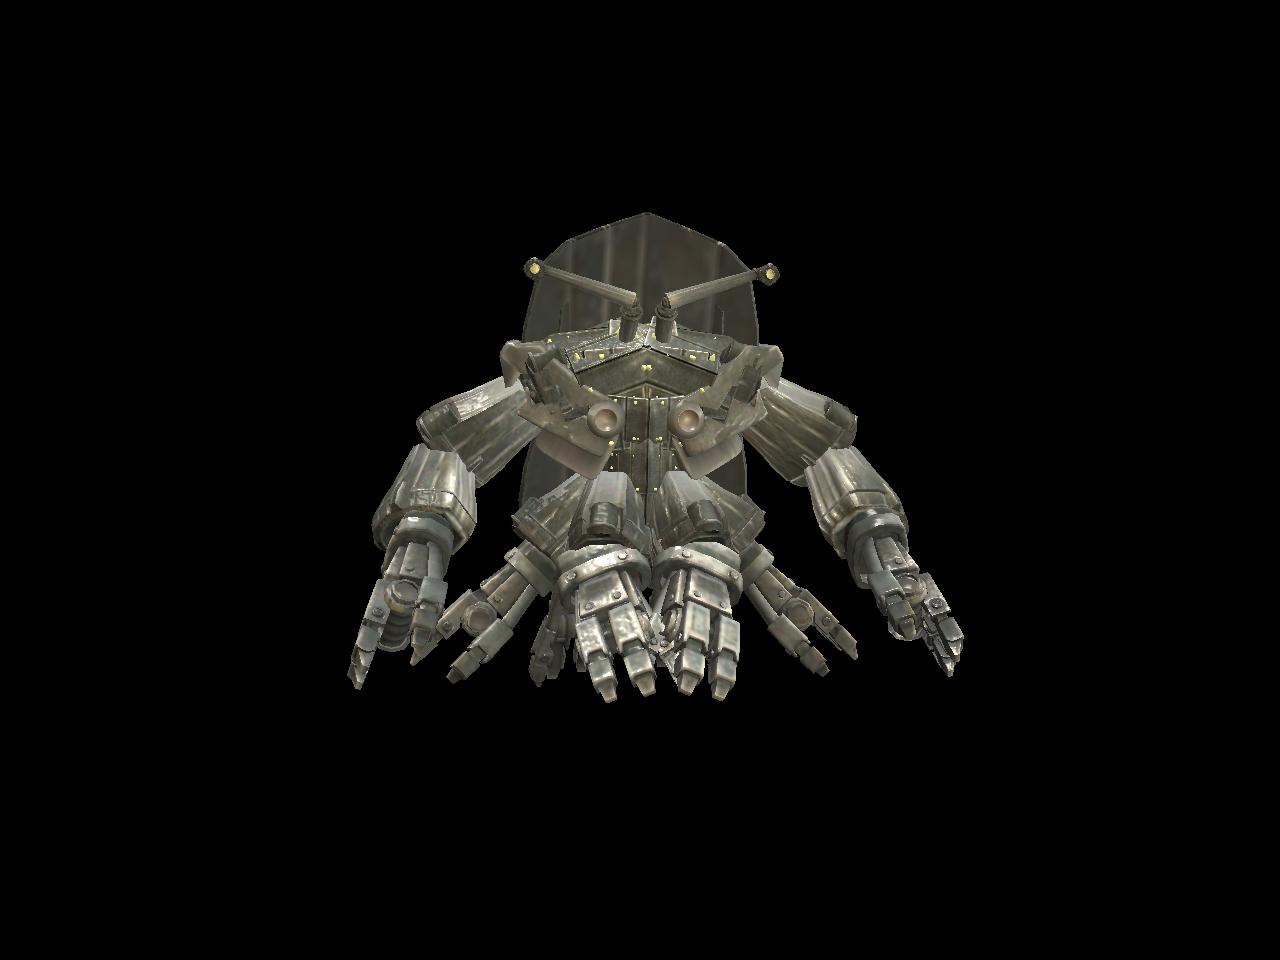 Robot Catafracta clase Behemoth[♫] CRE_Droide_Catafracta_Behemoth-1b4c212c_ful